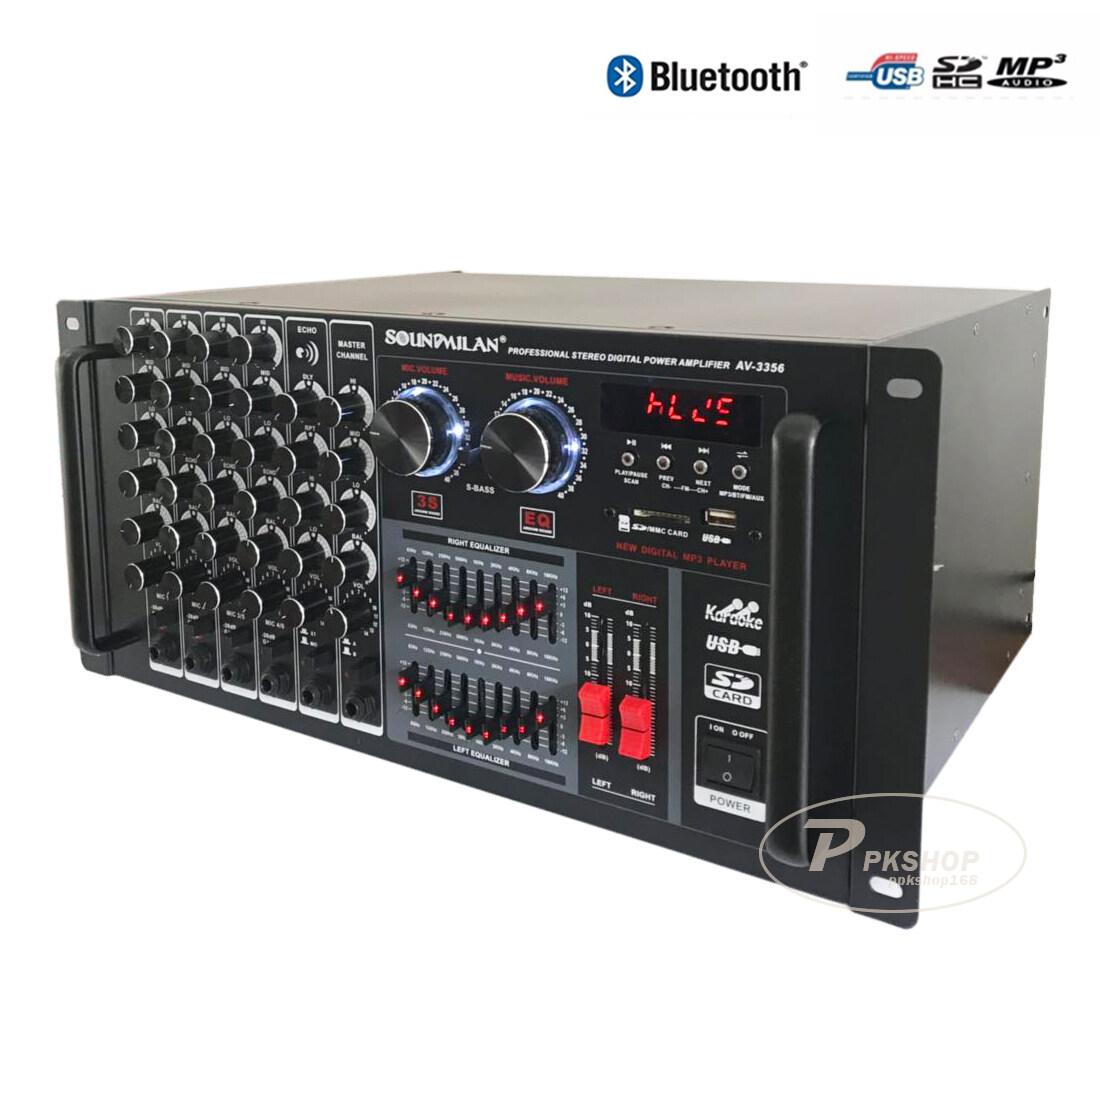 Sound Milan เครื่องขยายเสียงกลางแจ้ง เพาเวอร์มิกเซอร์ (แอมป์หน้ามิกซ์) Power Amplifier 800w (rms) มีบลูทูธ Usb Sd Card Fm รุ่น Av-3356.